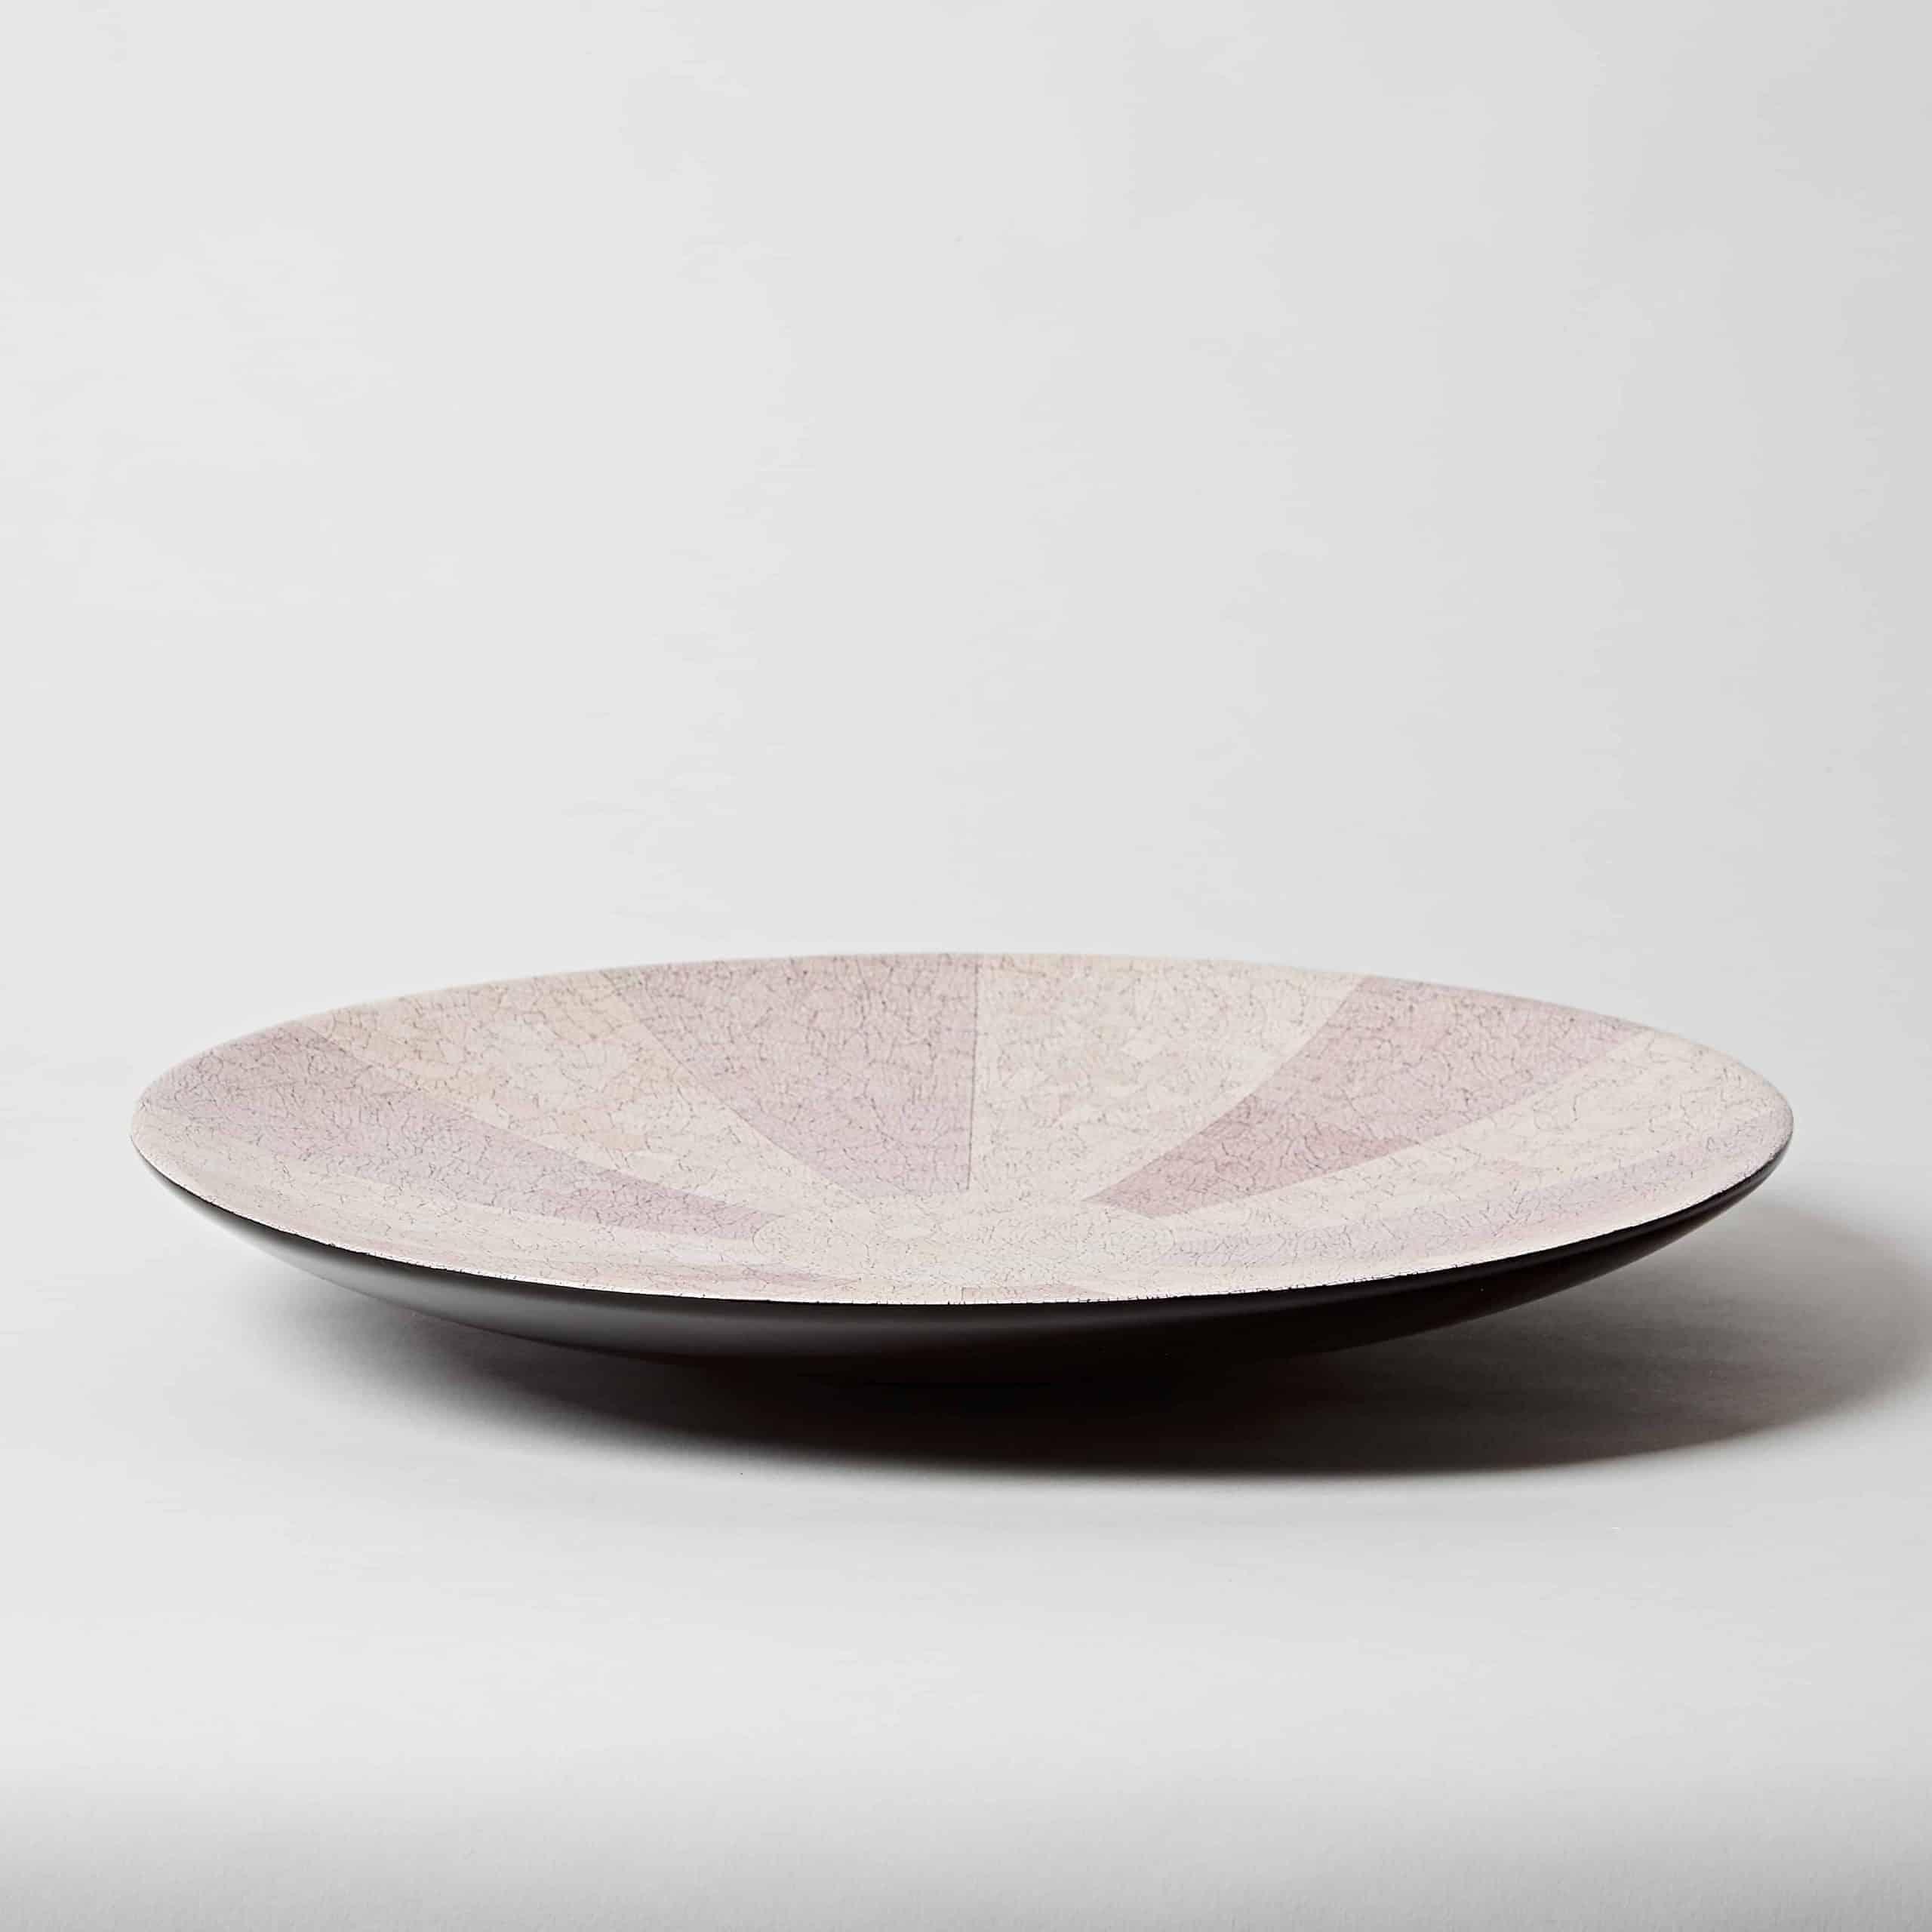 Eggshell plate